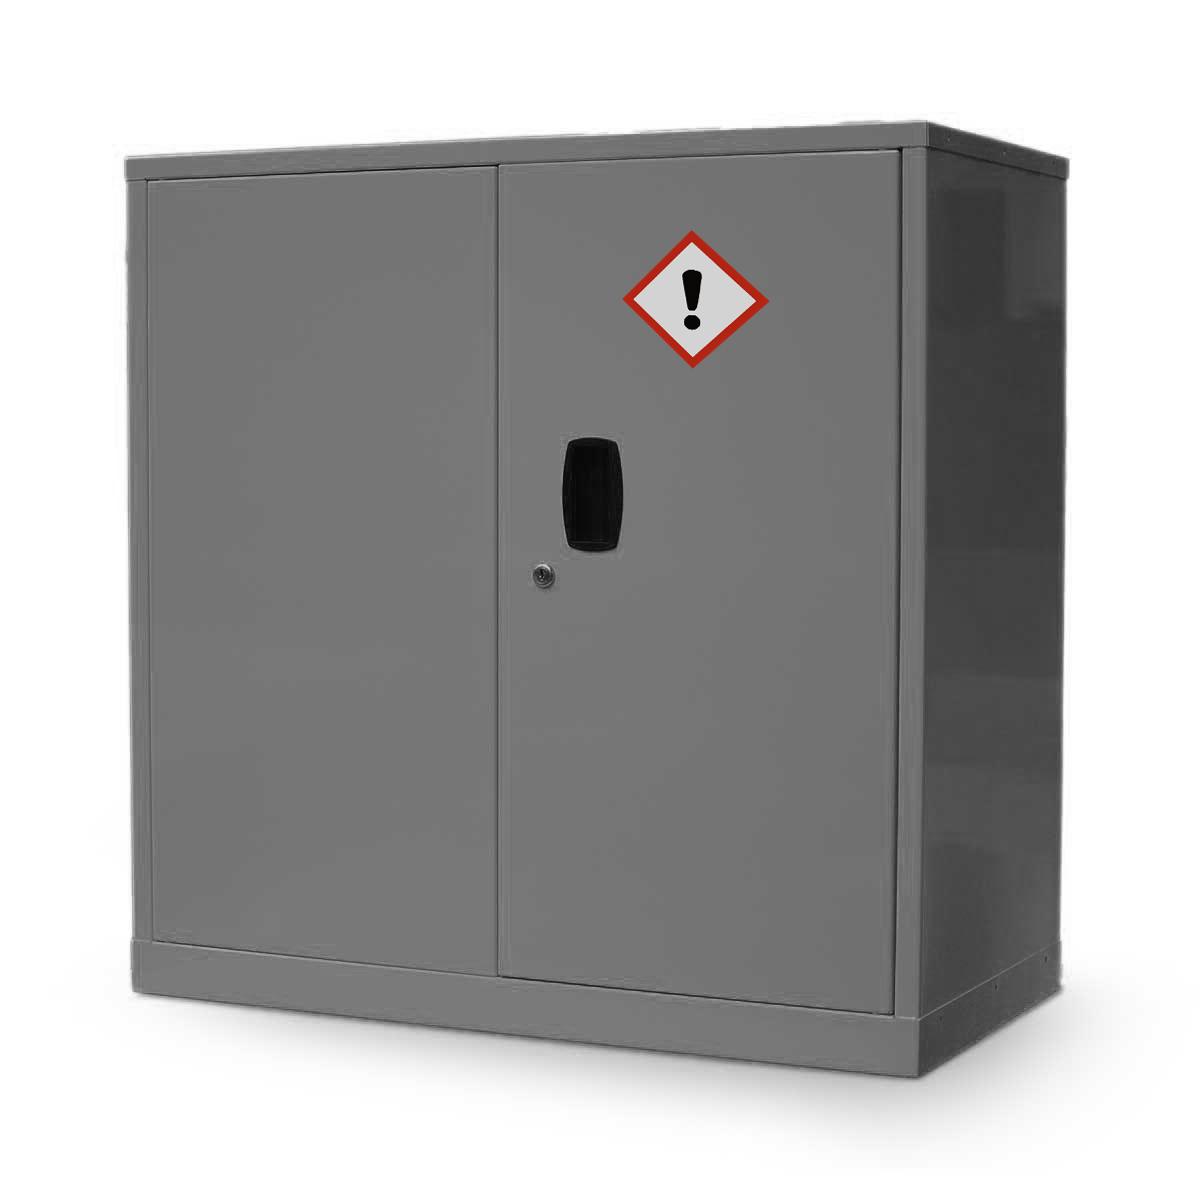 129 coshh storage cabinets